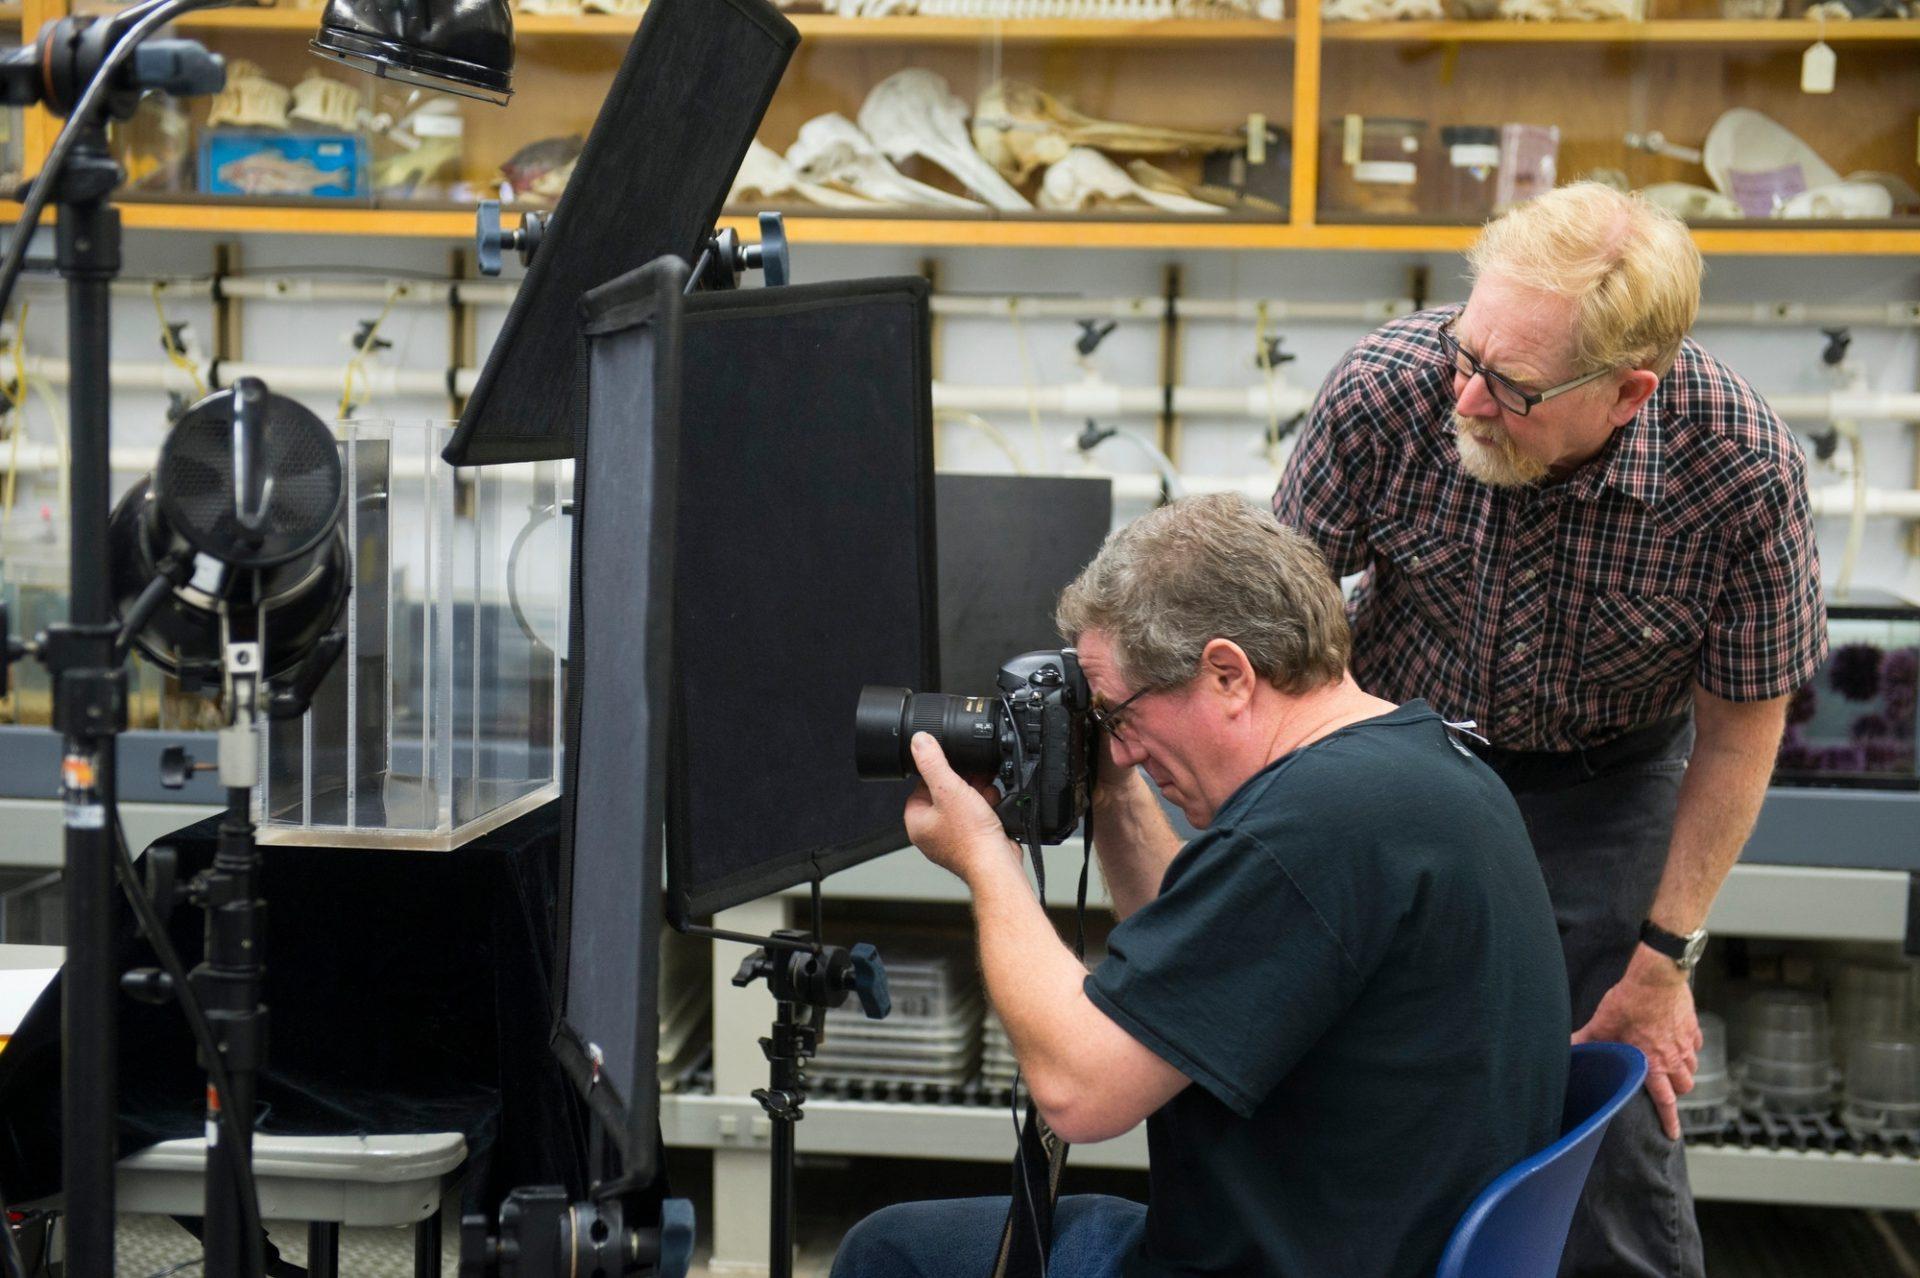 Photo: Joel Sartore and a staff member prepare for a photo shoot at the Monterey Bay Aquarium.